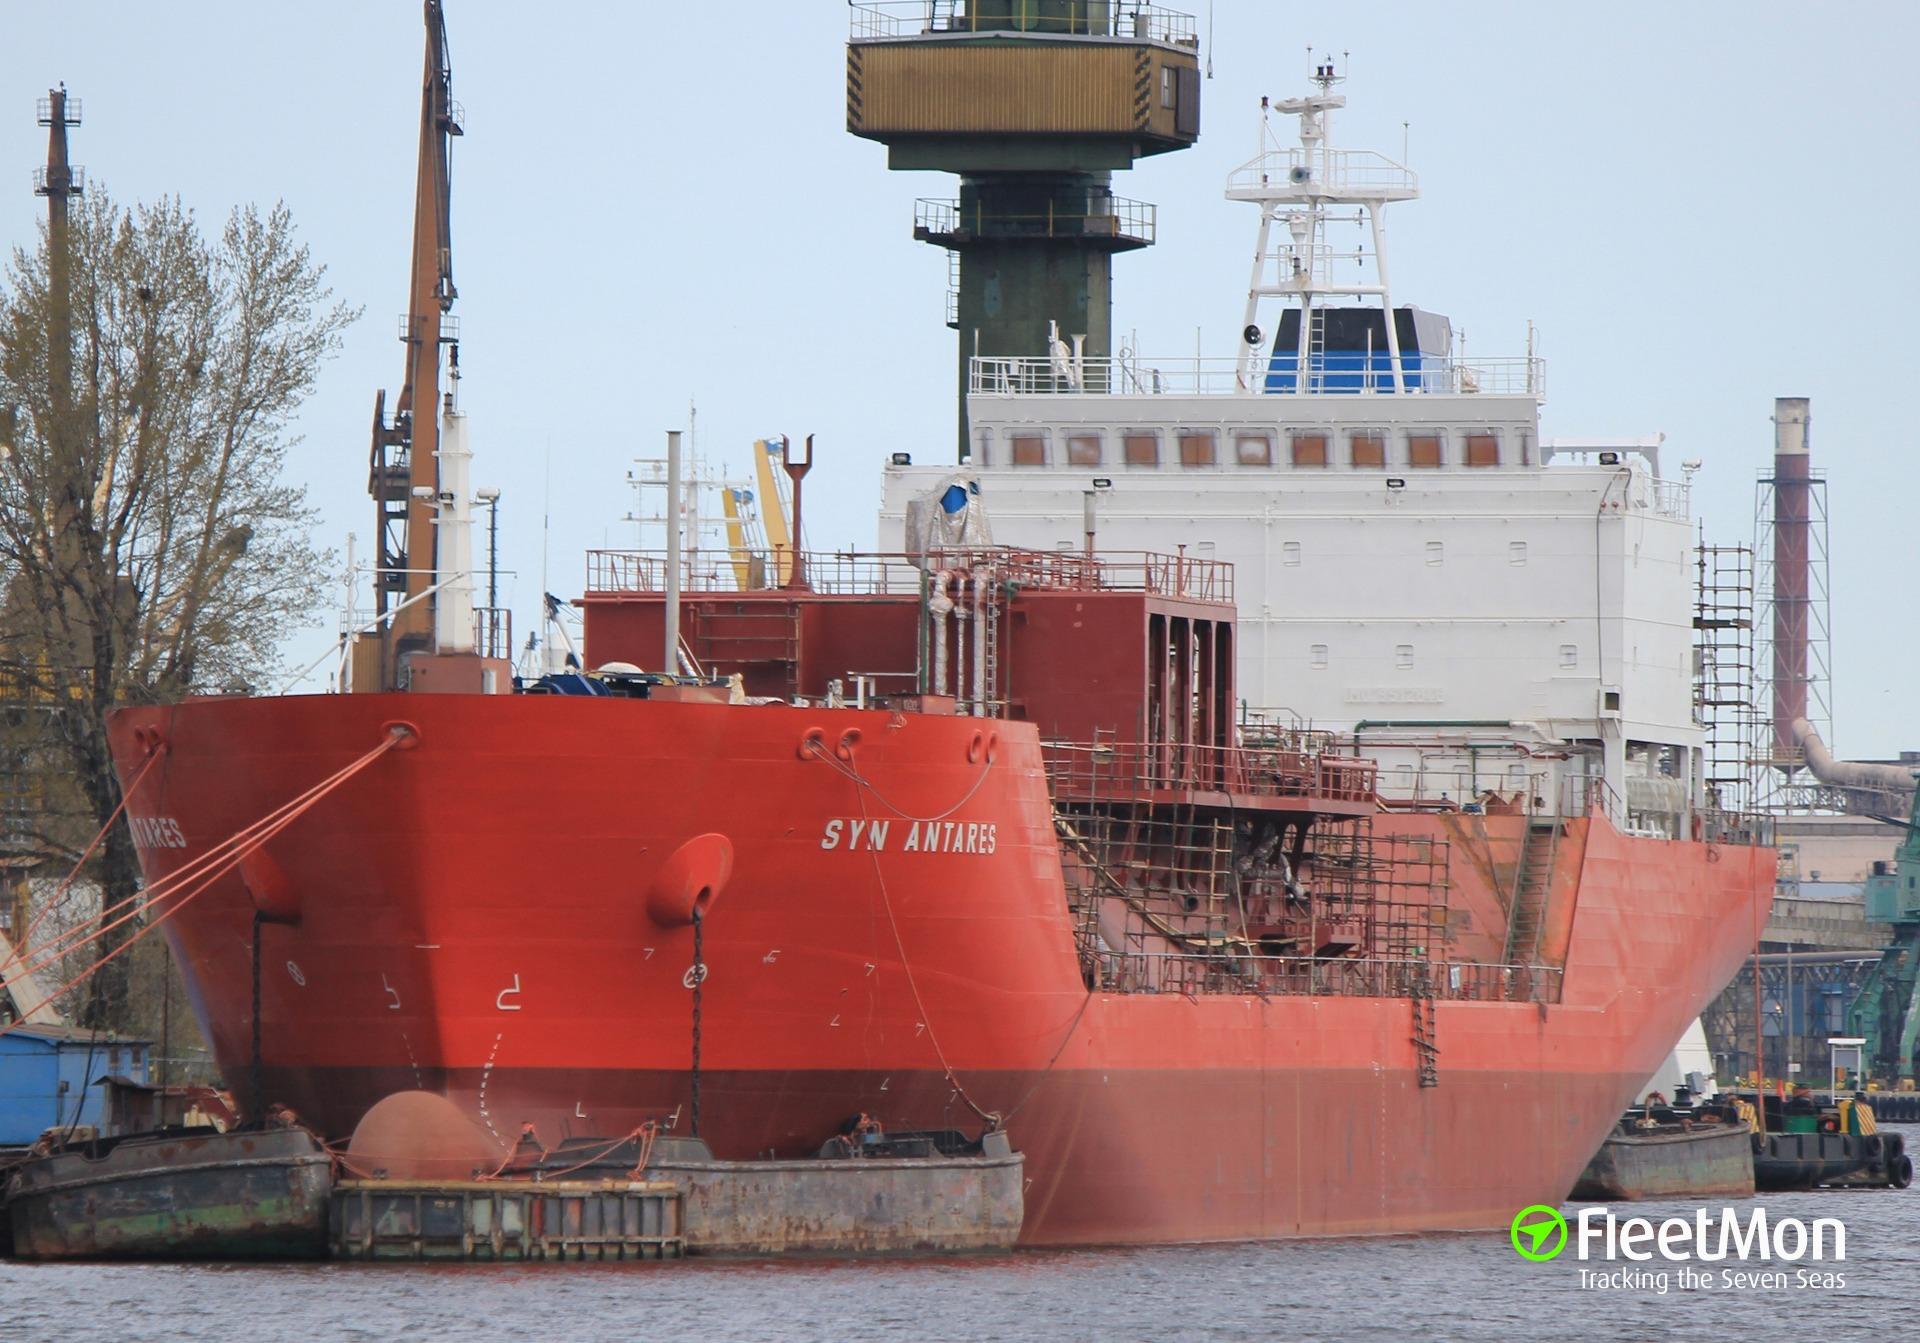 LPG tanker SYN ANTARES aground